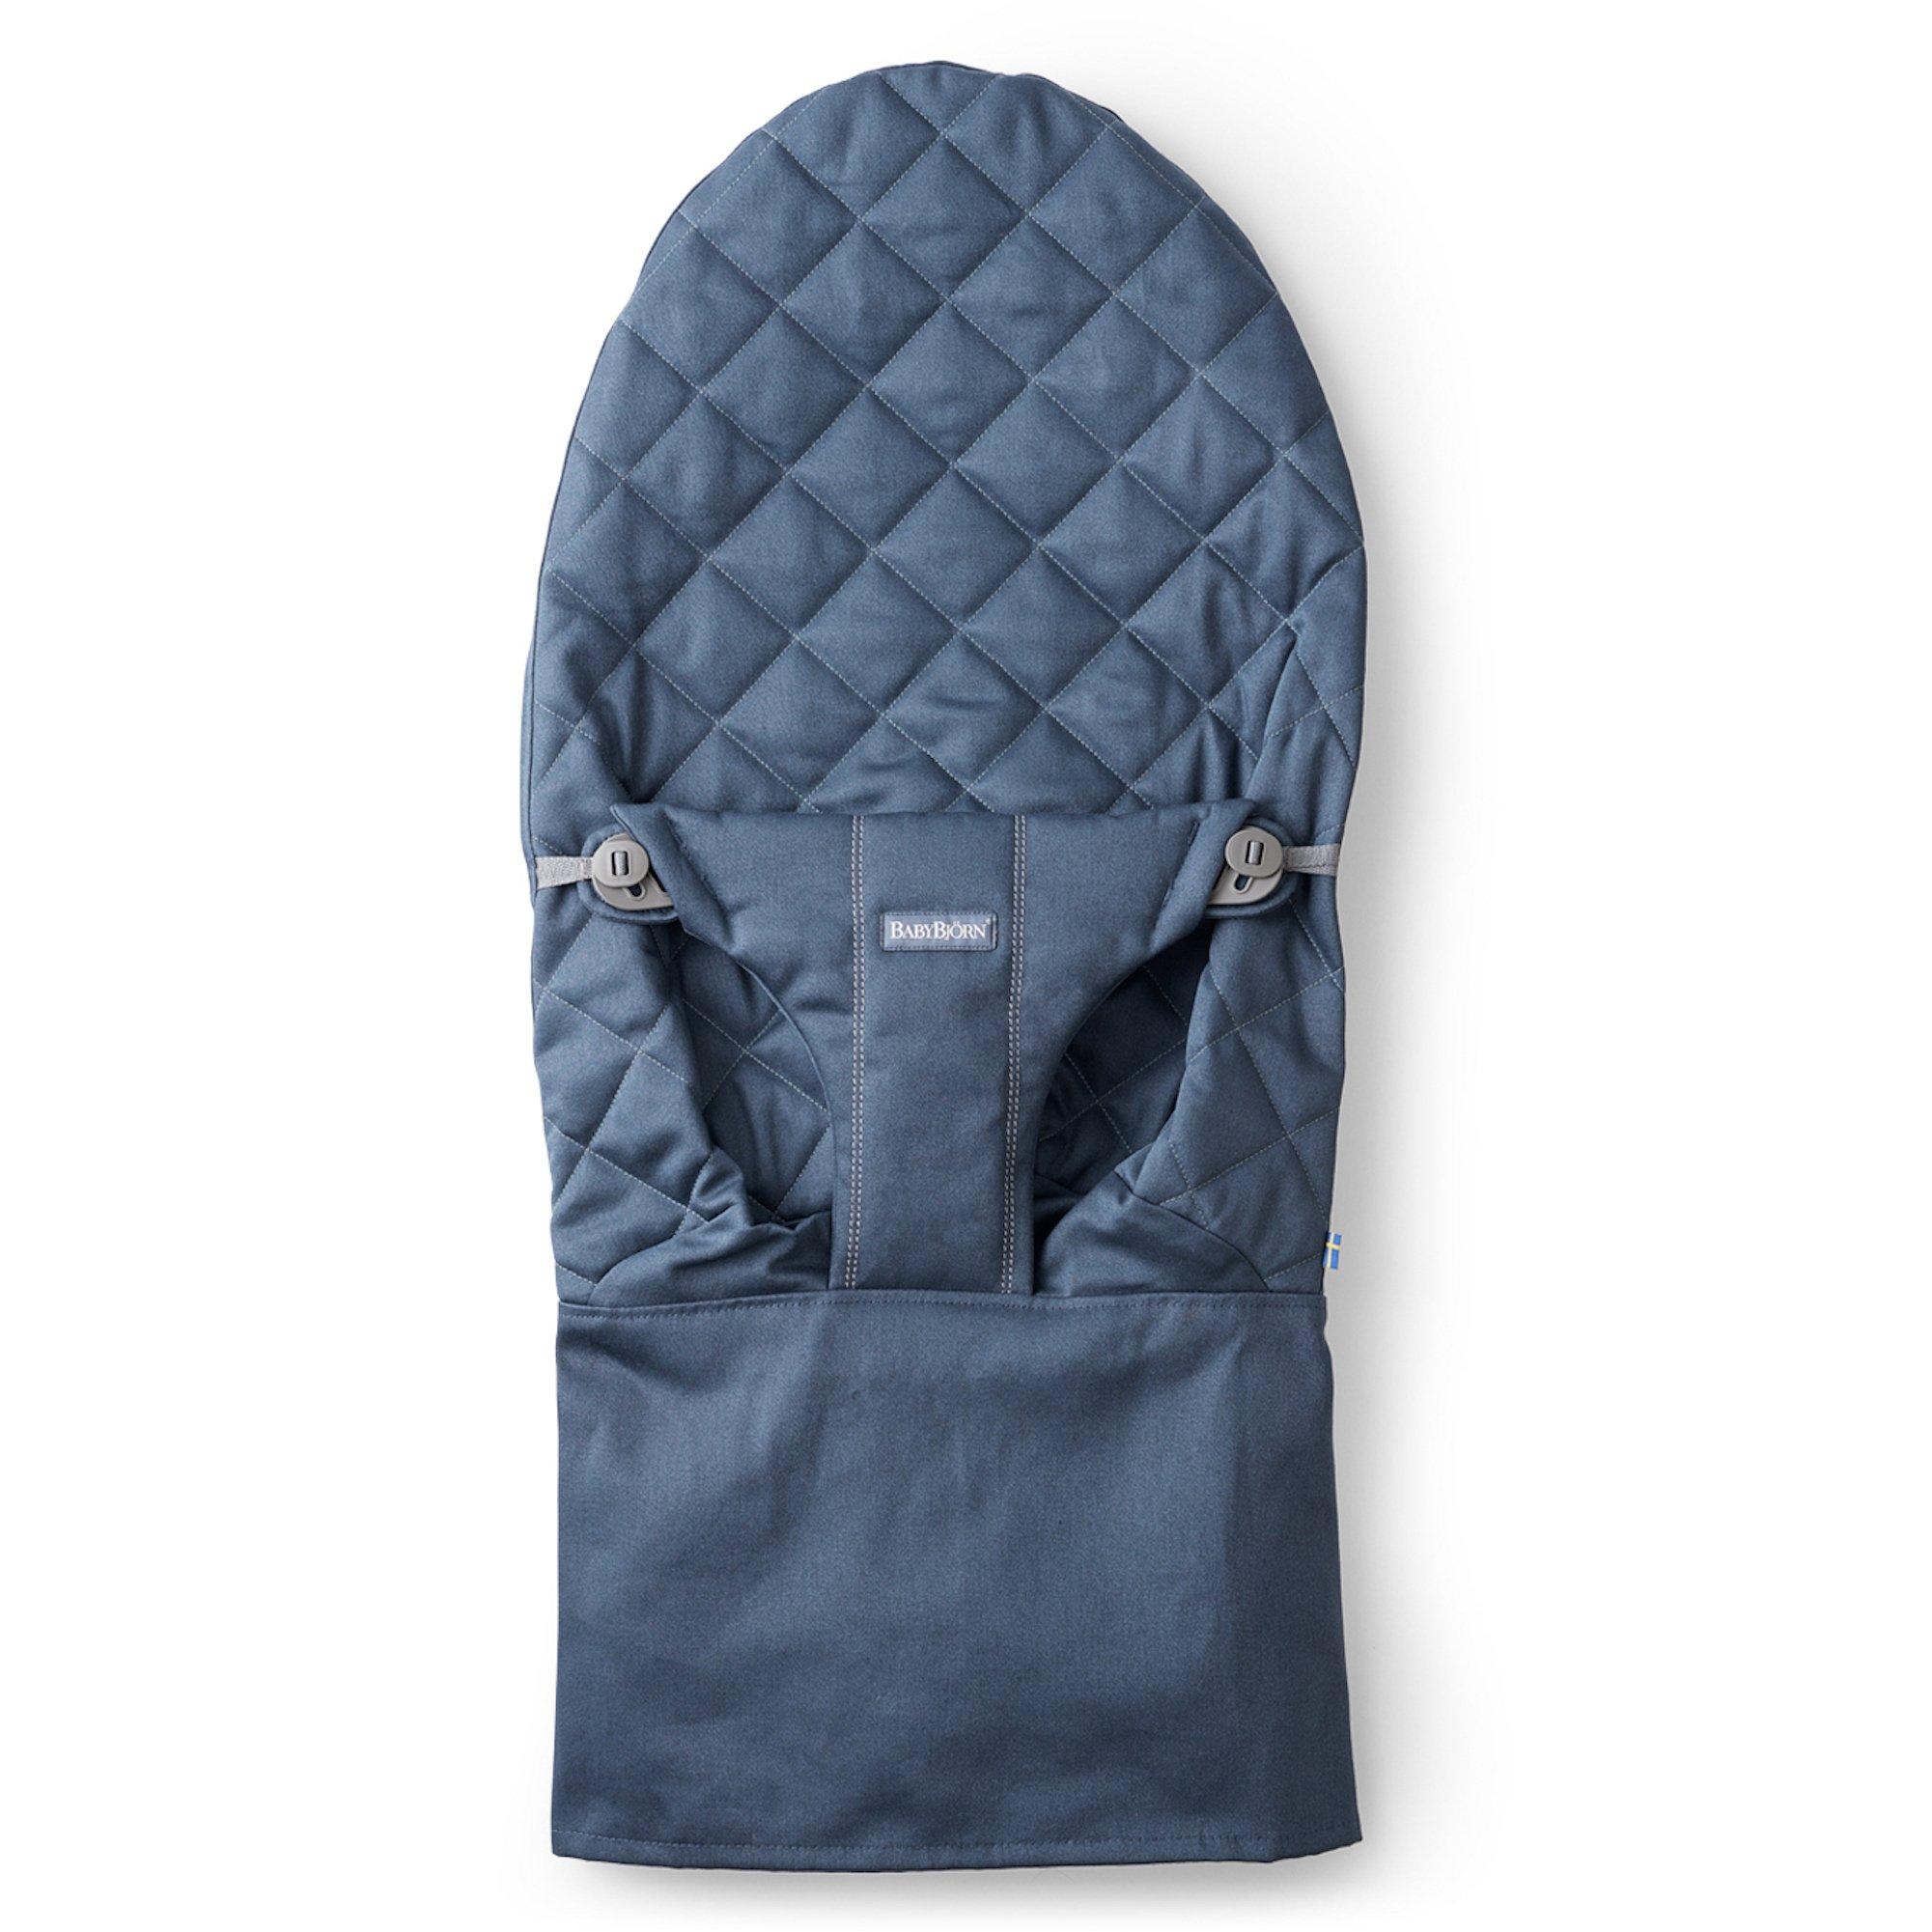 BABYBJORN BabyBjorn Fabric Seat for Bouncer, Midnight Blue, Cotton, Midnight Blue